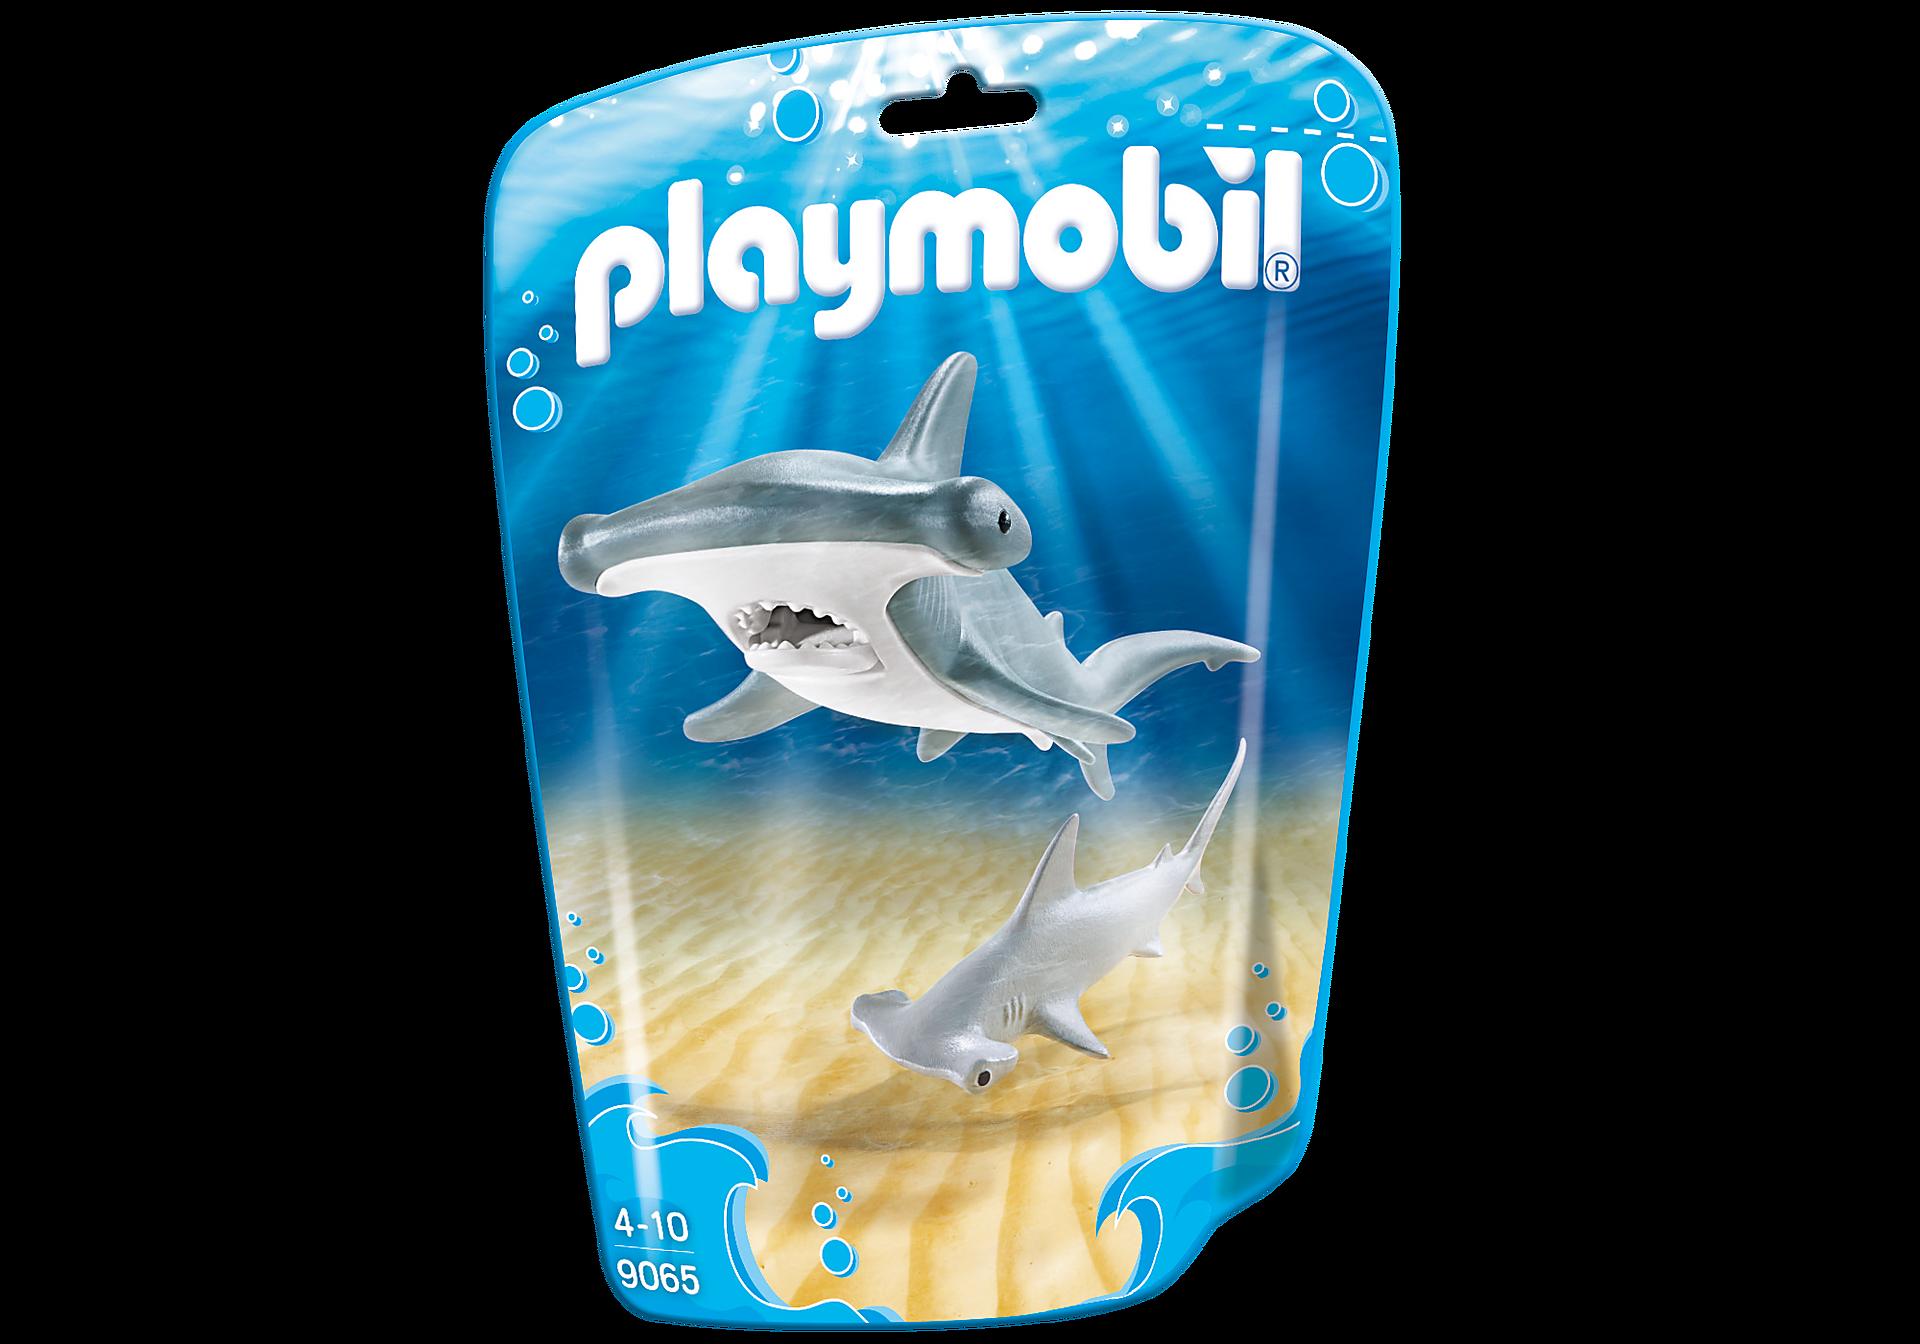 http://media.playmobil.com/i/playmobil/9065_product_box_front/Σφυροκέφαλος καρχαρίας με το μικρό του